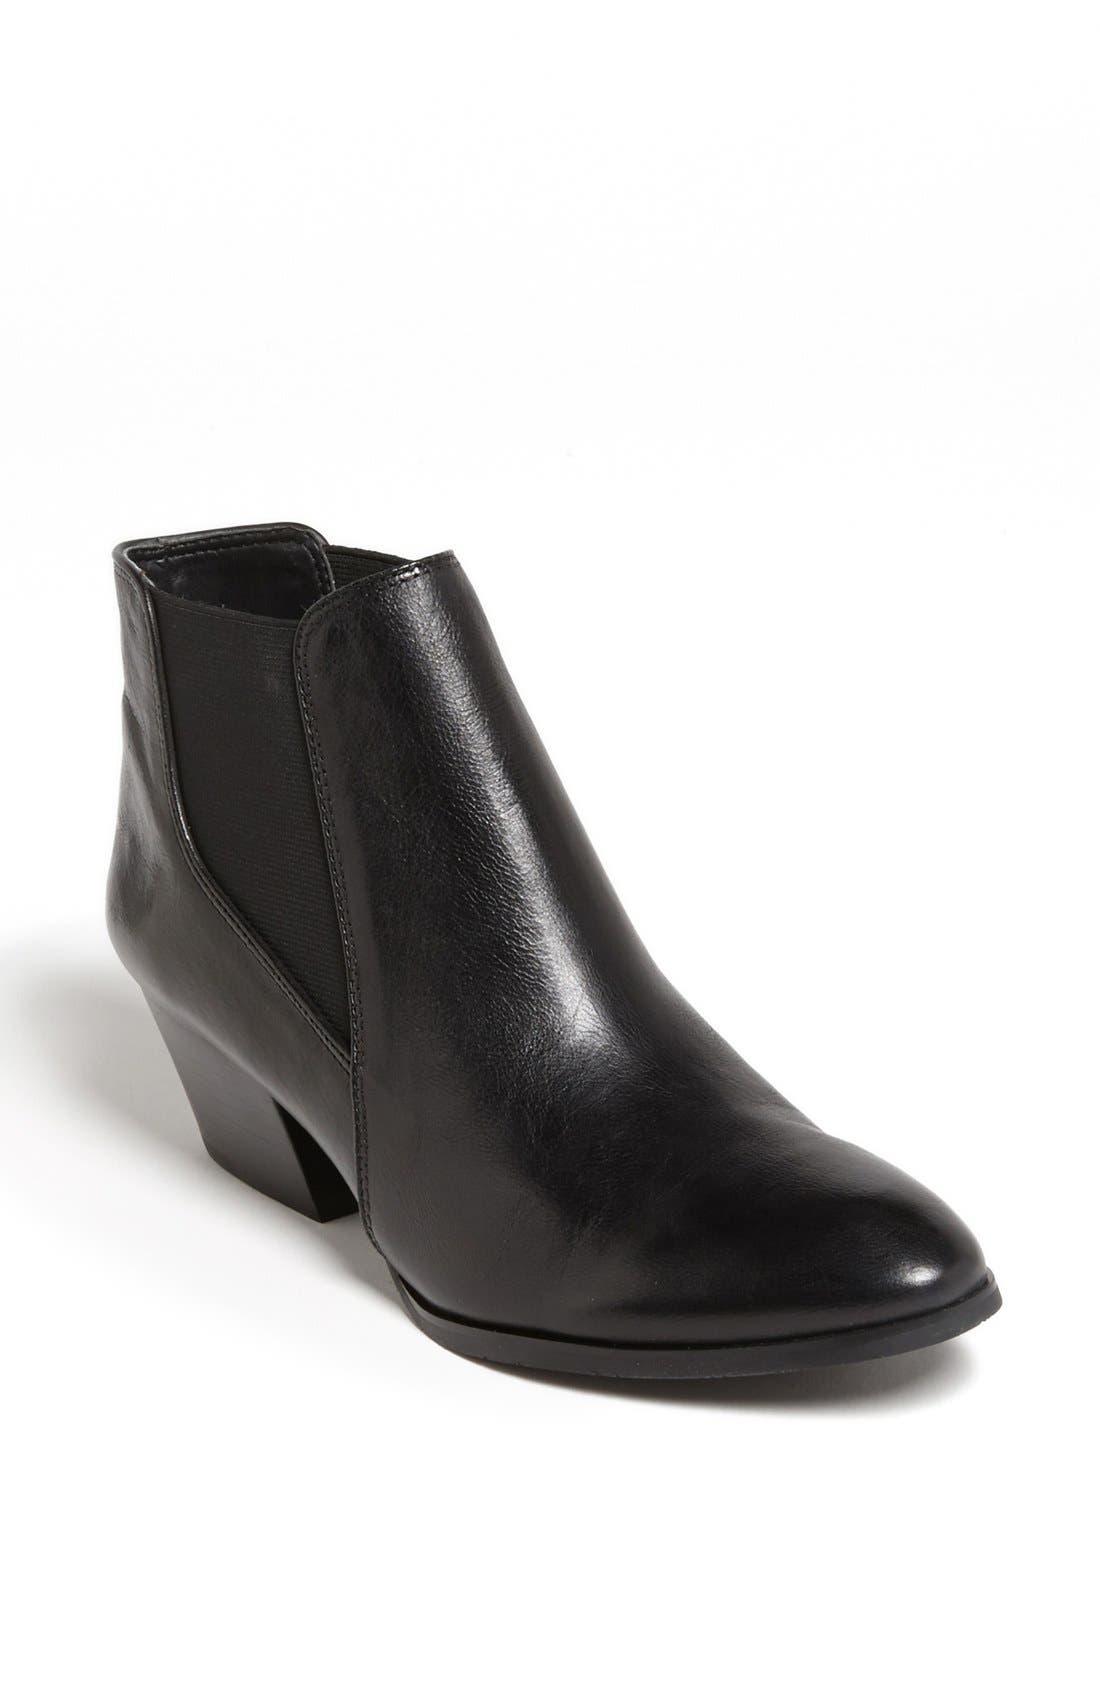 Main Image - Franco Sarto 'Quinne' Boot